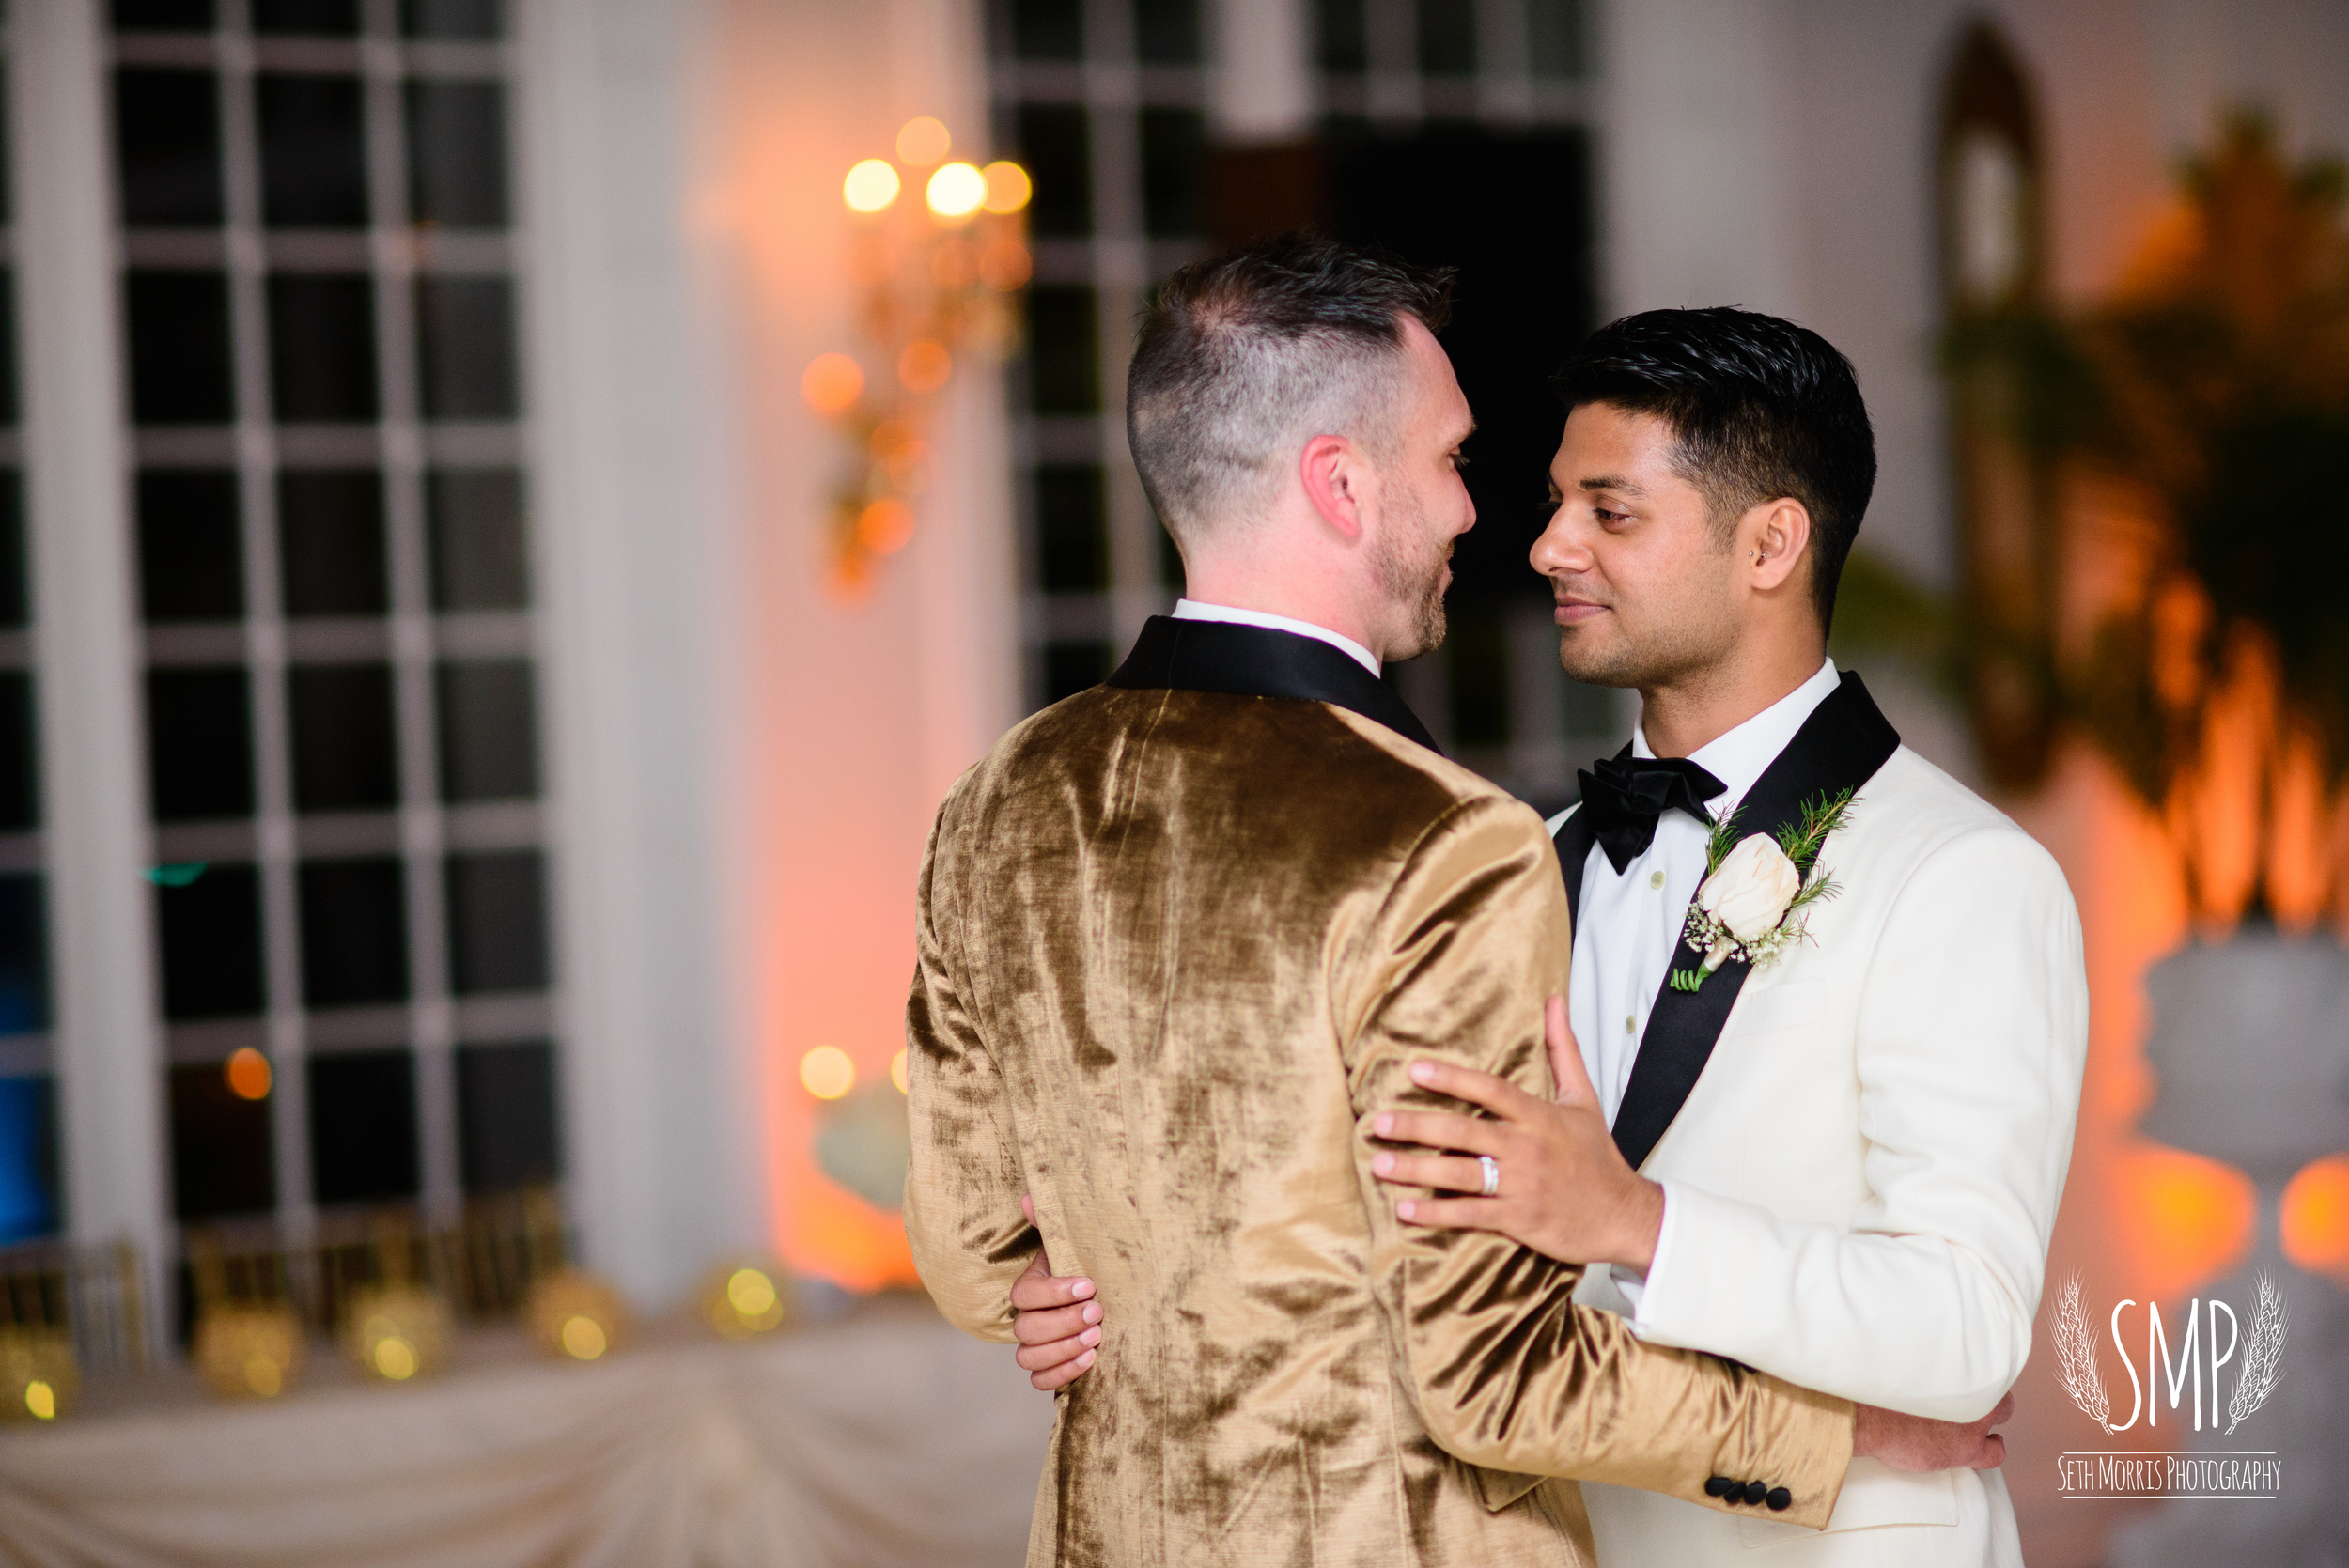 same-sex-wedding-photographer-chicago-illinois-109.jpg